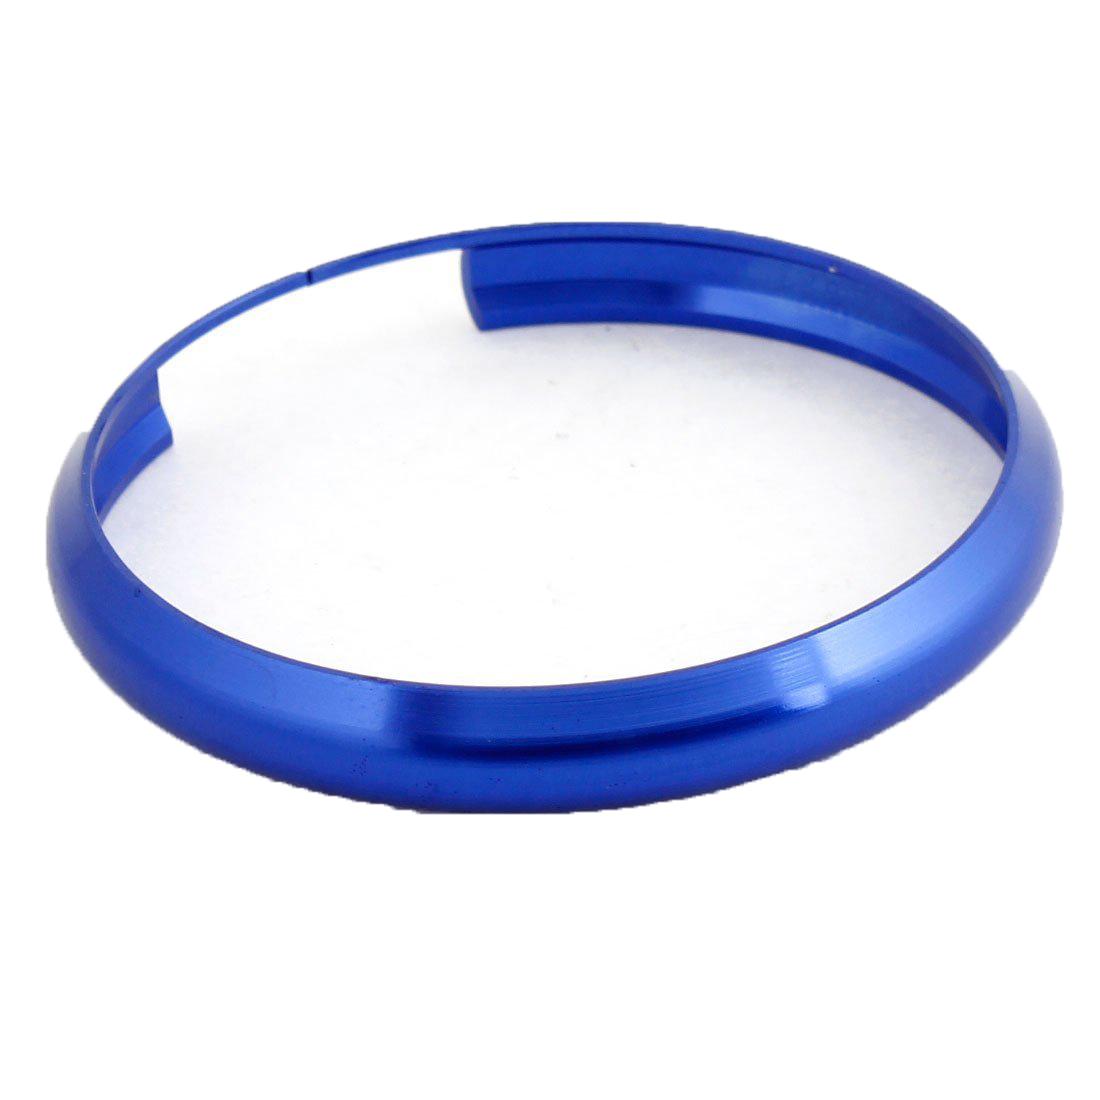 auto aluminium ring 45 mm durchmesser fuer mini schluesselanhaenger marineb s8e6 ebay. Black Bedroom Furniture Sets. Home Design Ideas